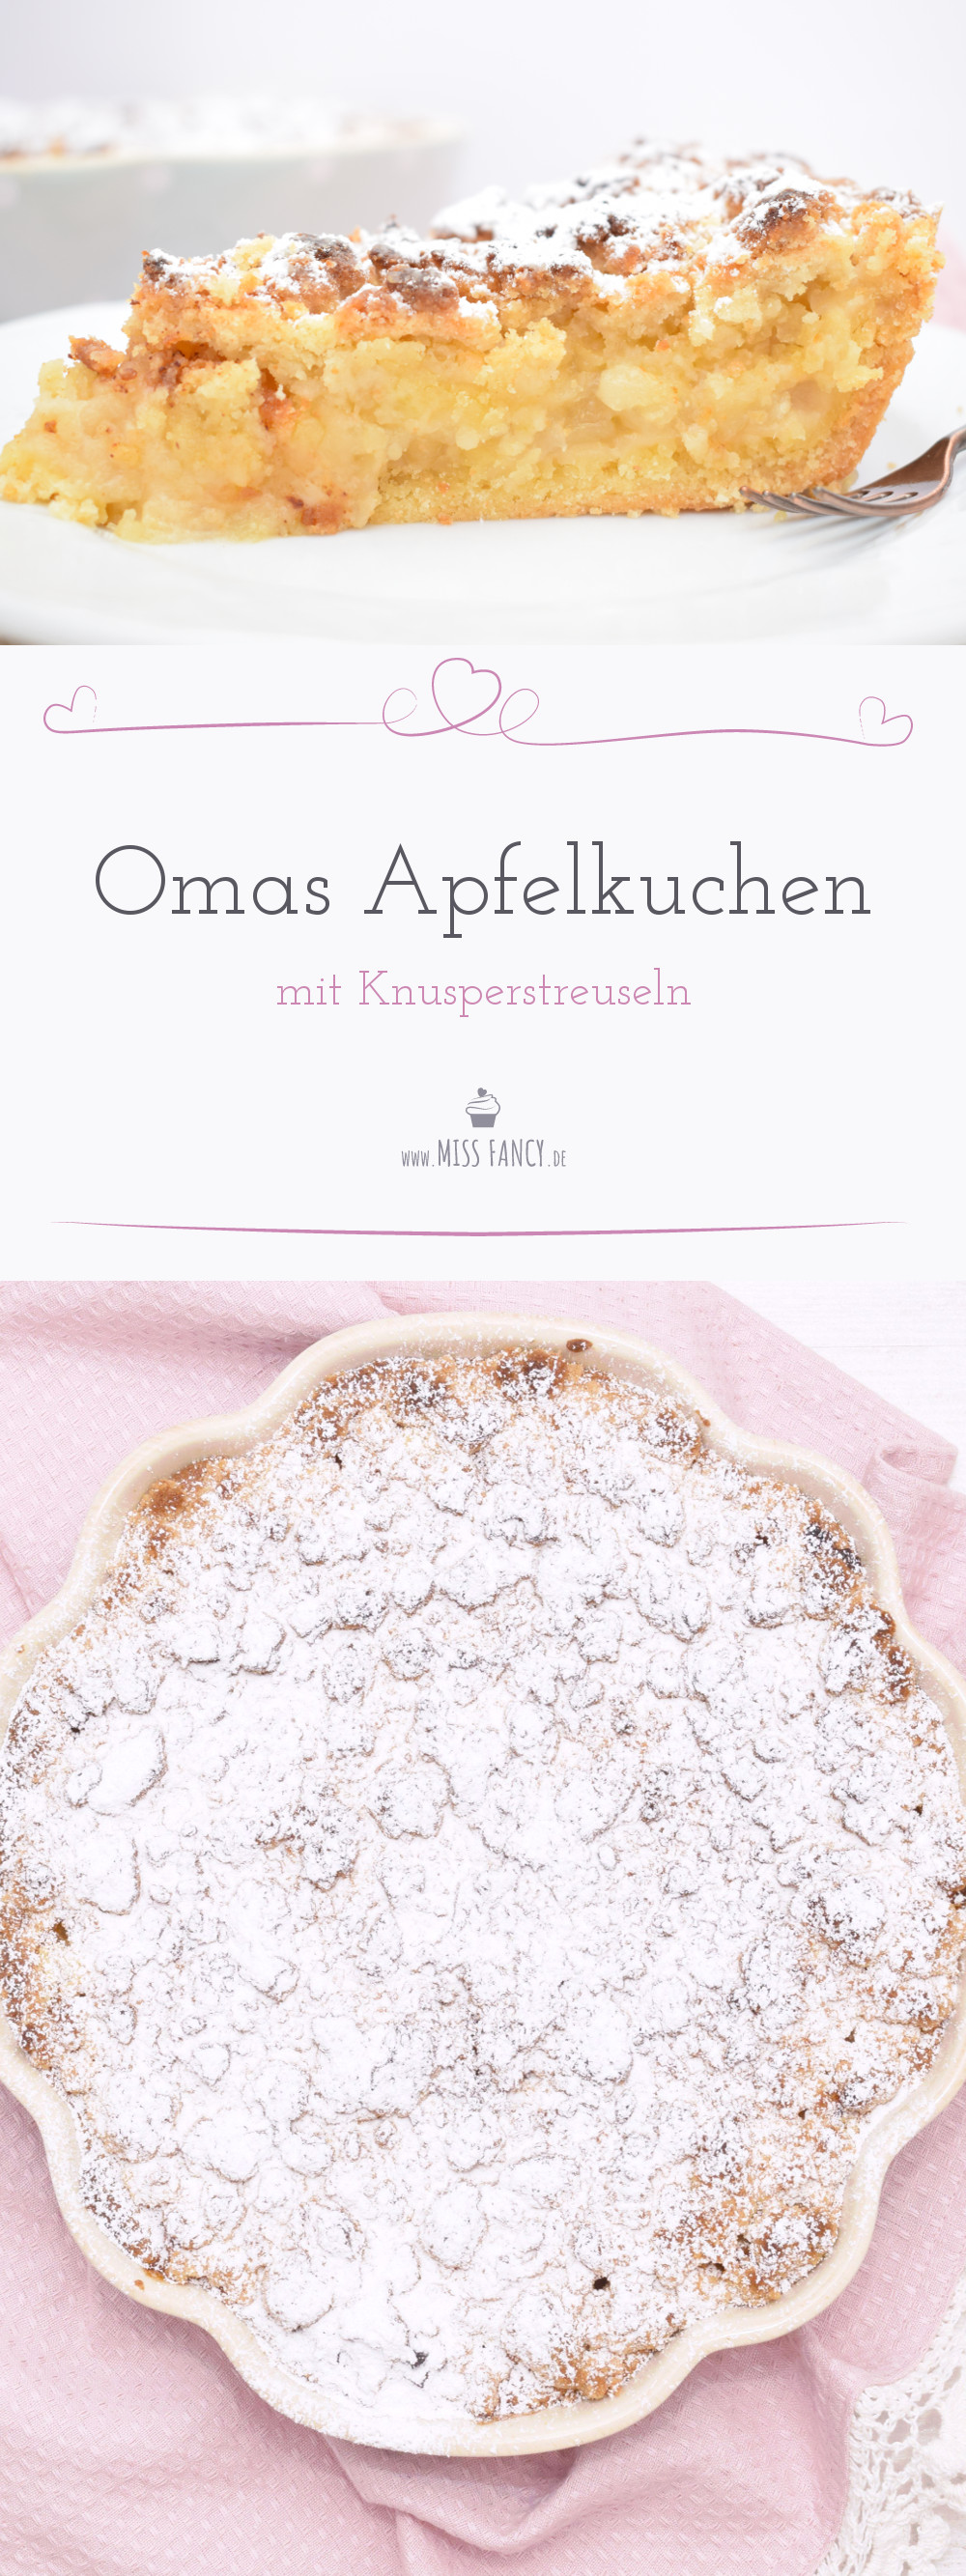 Rezept-omas-Apfelkuchen-missfancy-foodblog